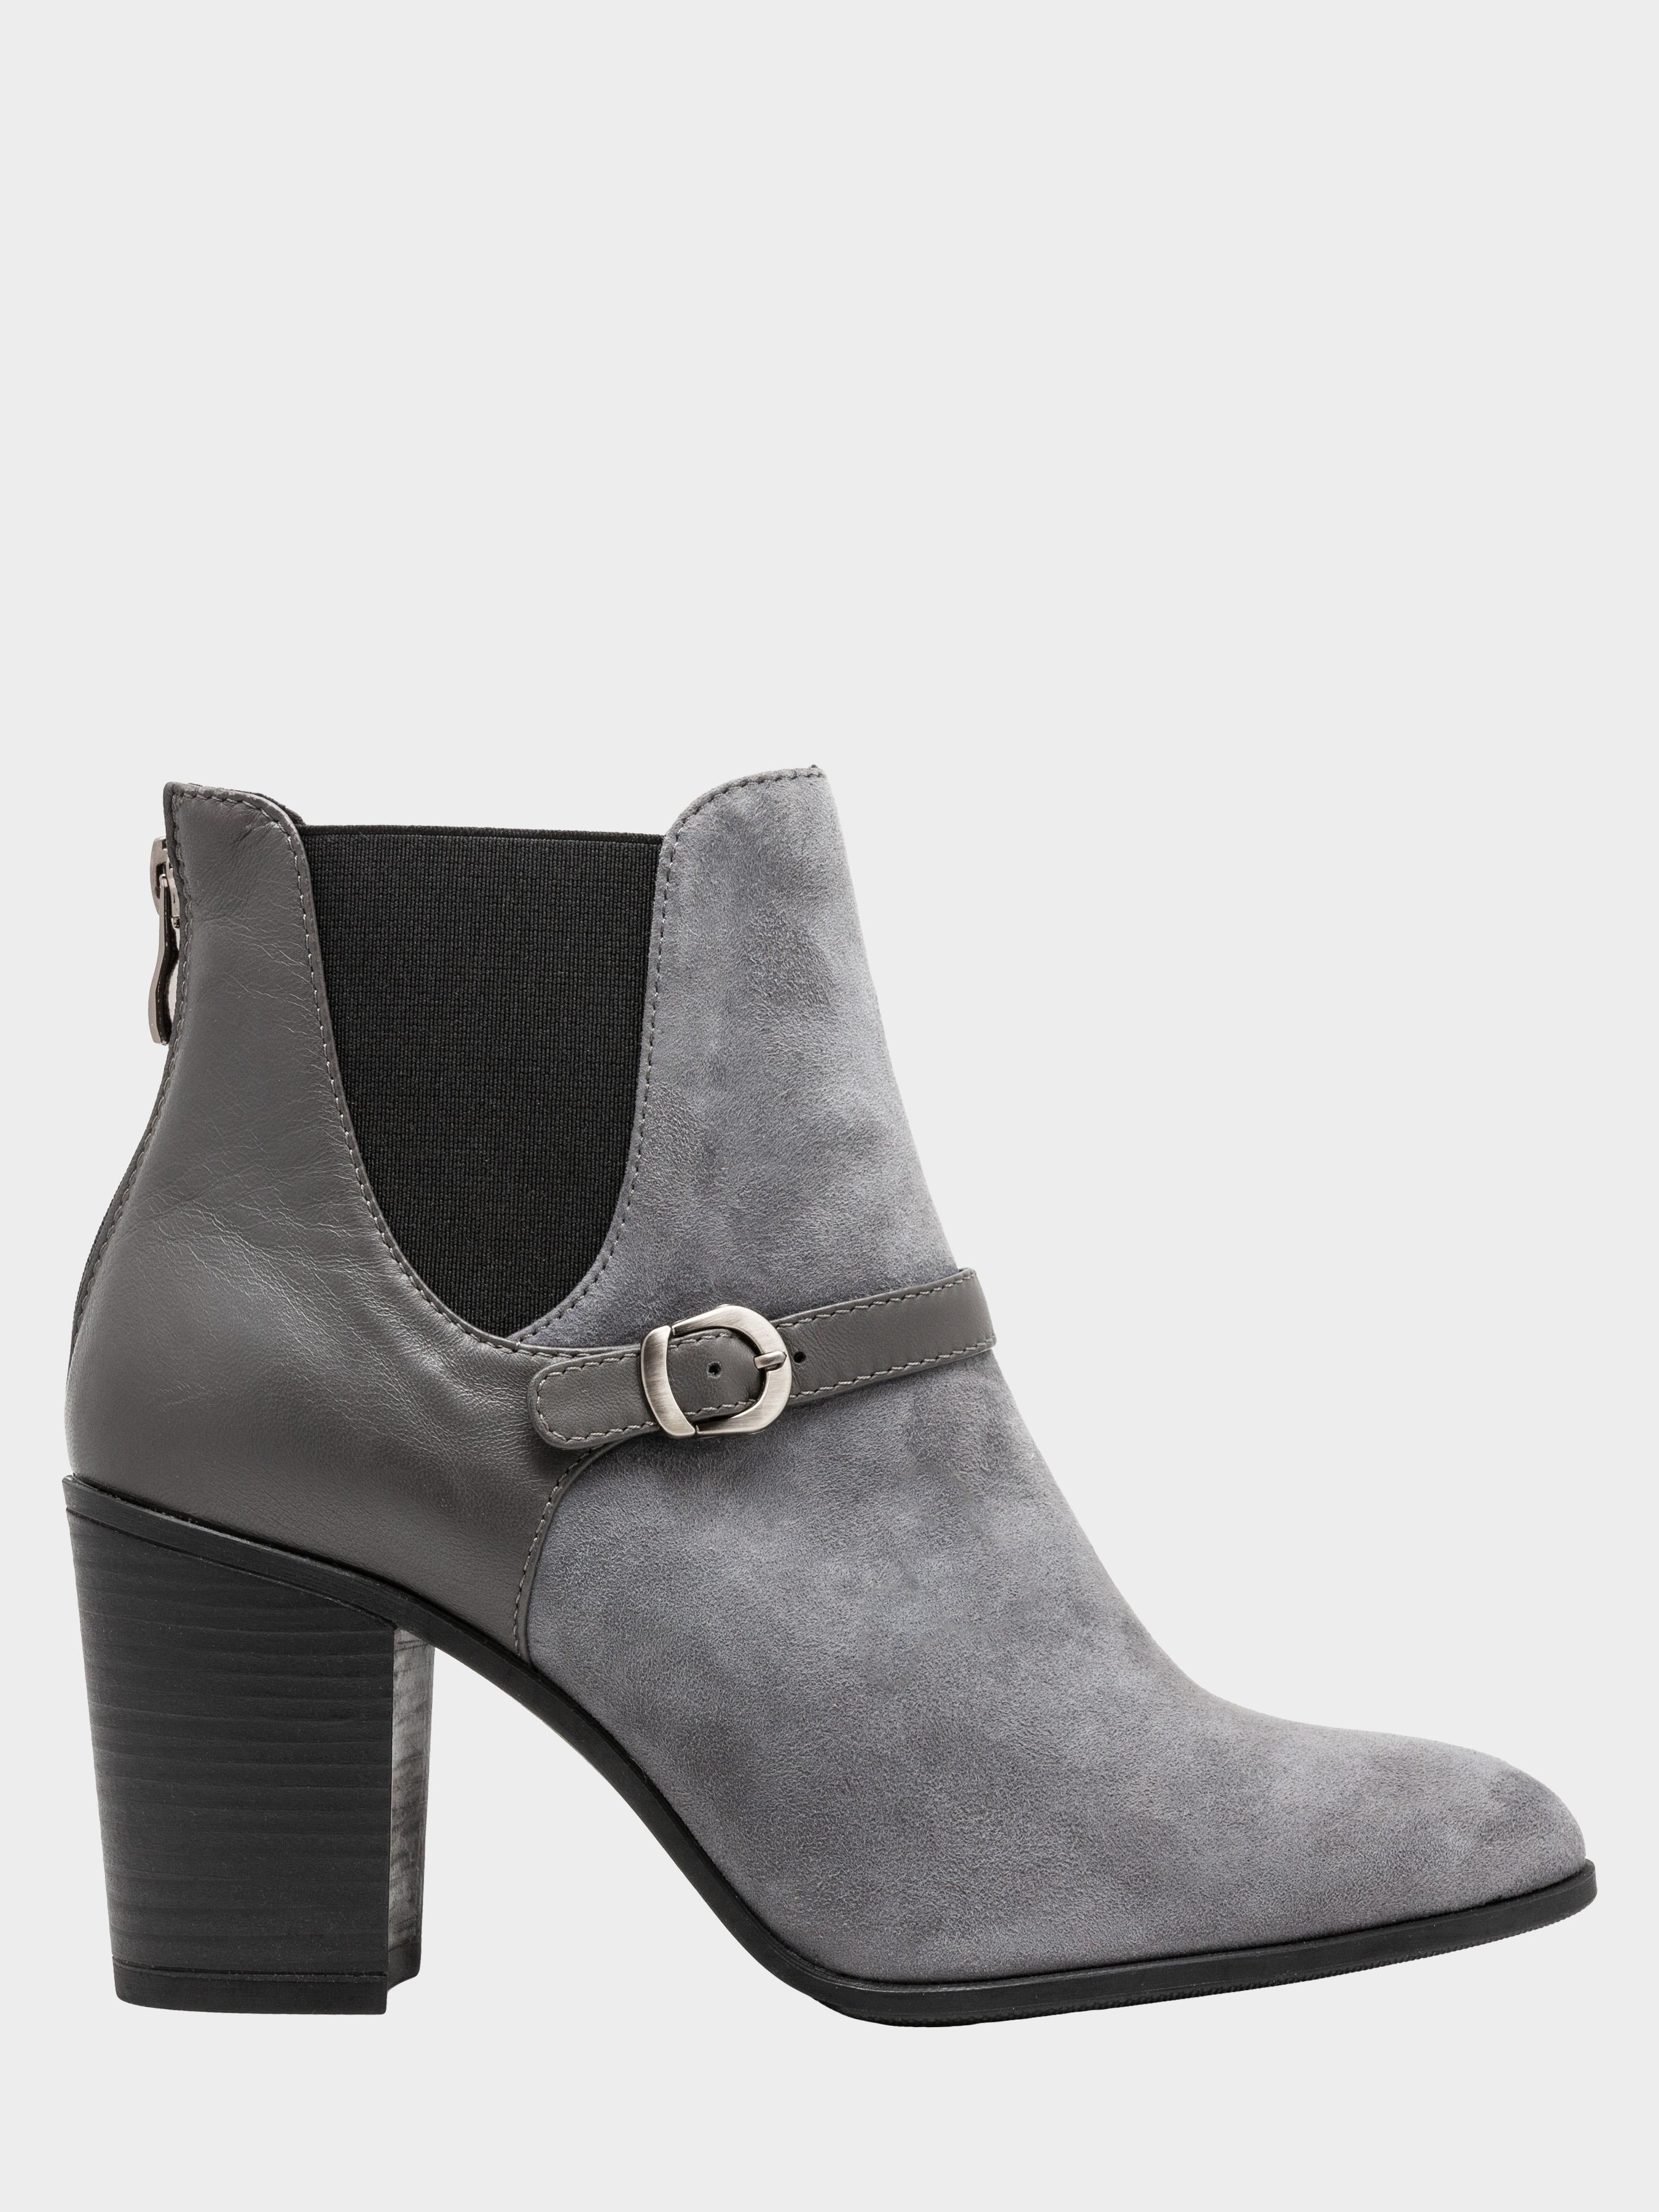 Ботинки для женщин Ботинки женские ENZO VERRATTI 18-9695-2gr цена, 2017